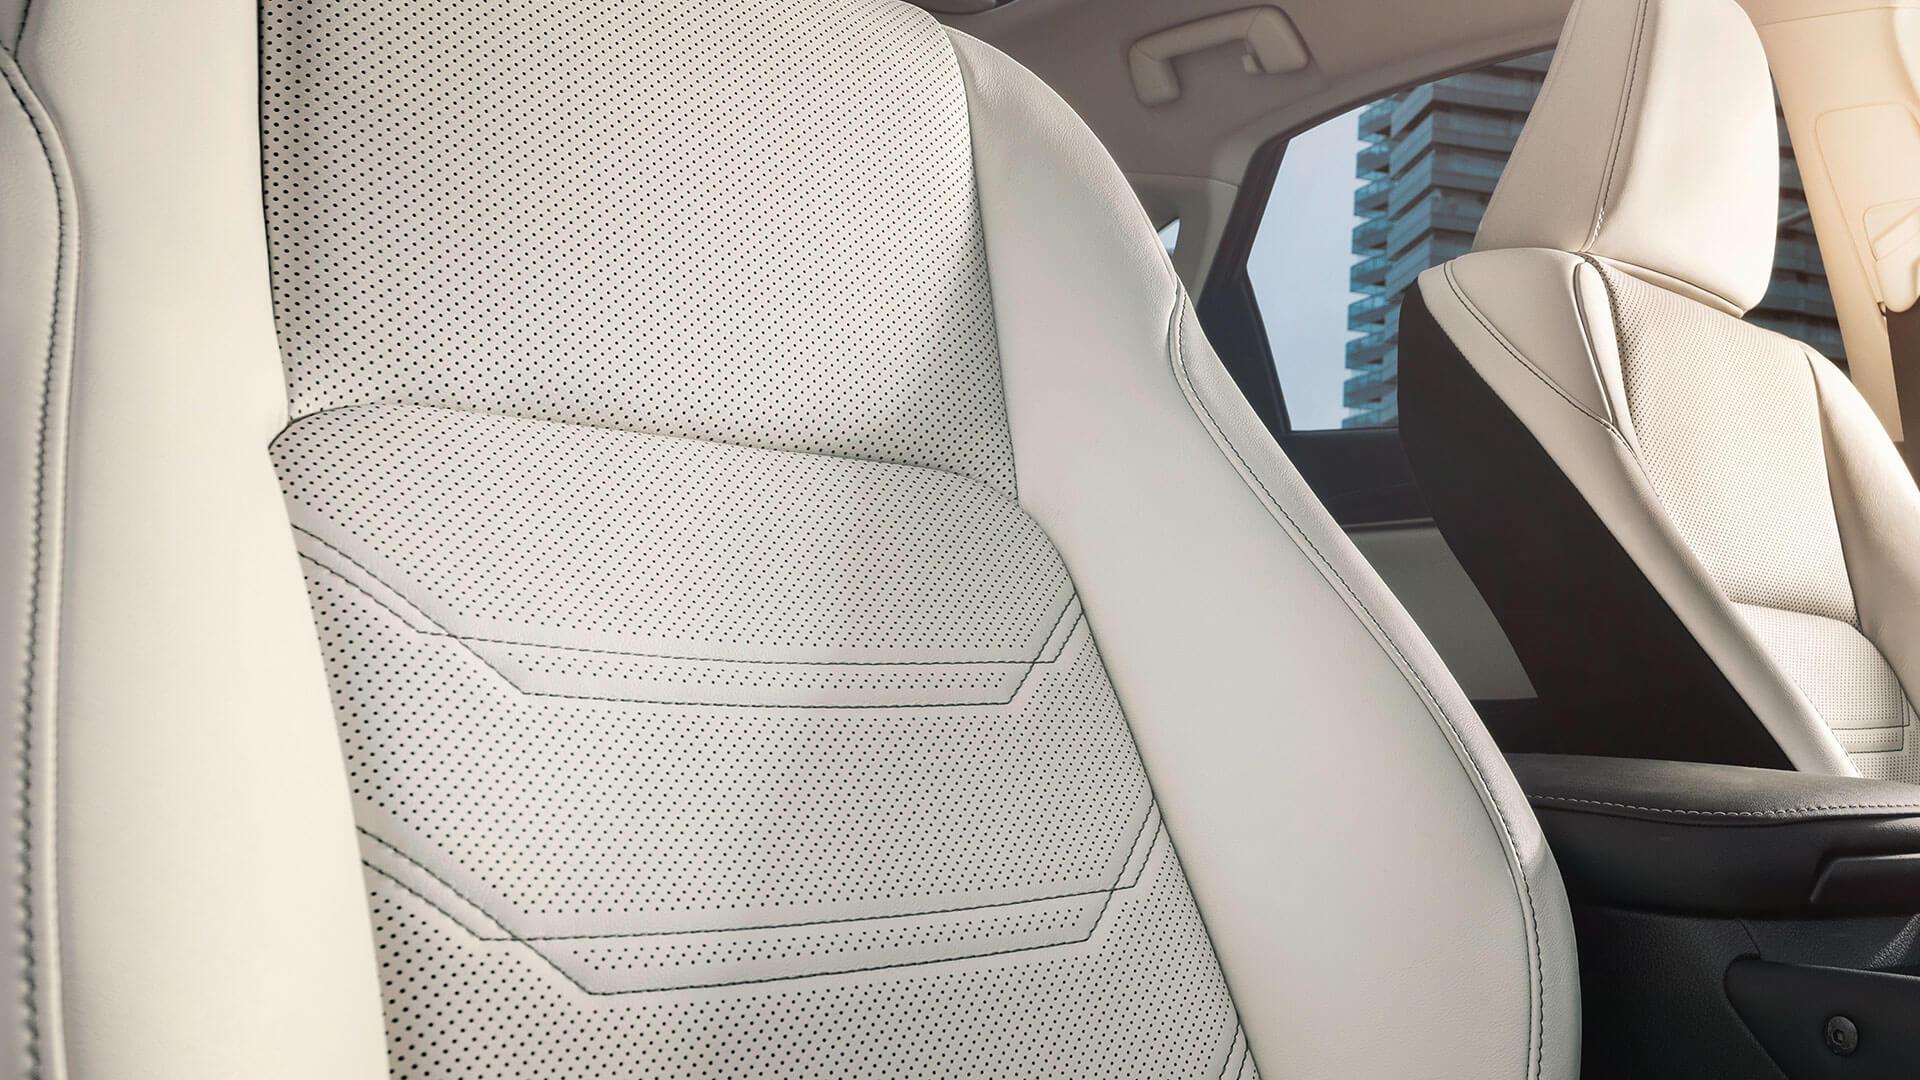 2018 lexus nx my18 features heated seats